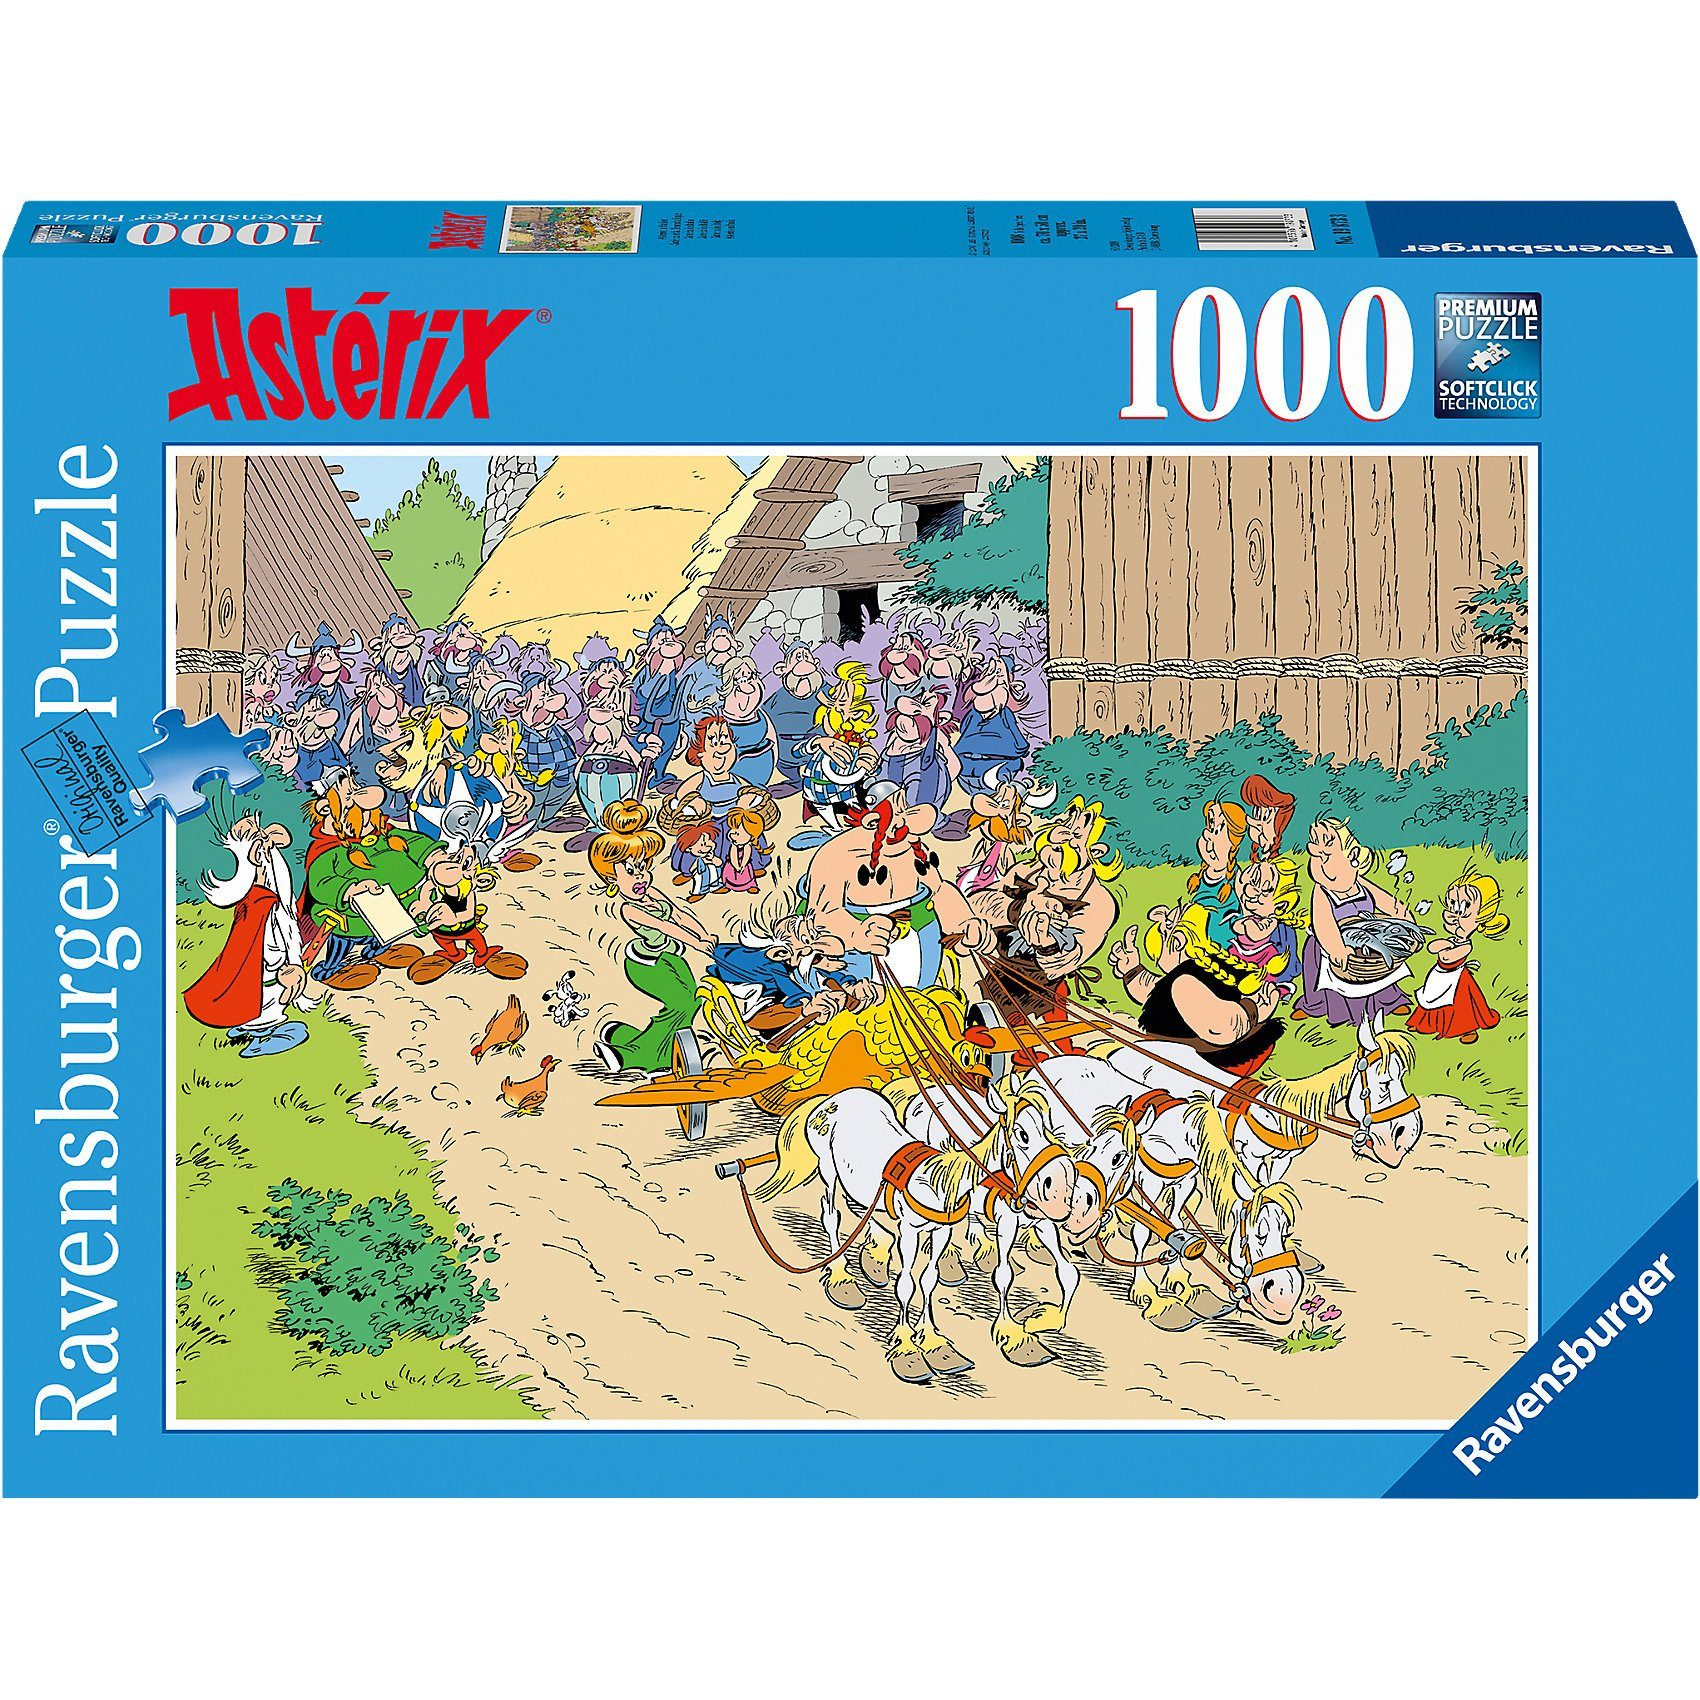 Ravensburger Puzzle 1000 Teile Asterix in Italien